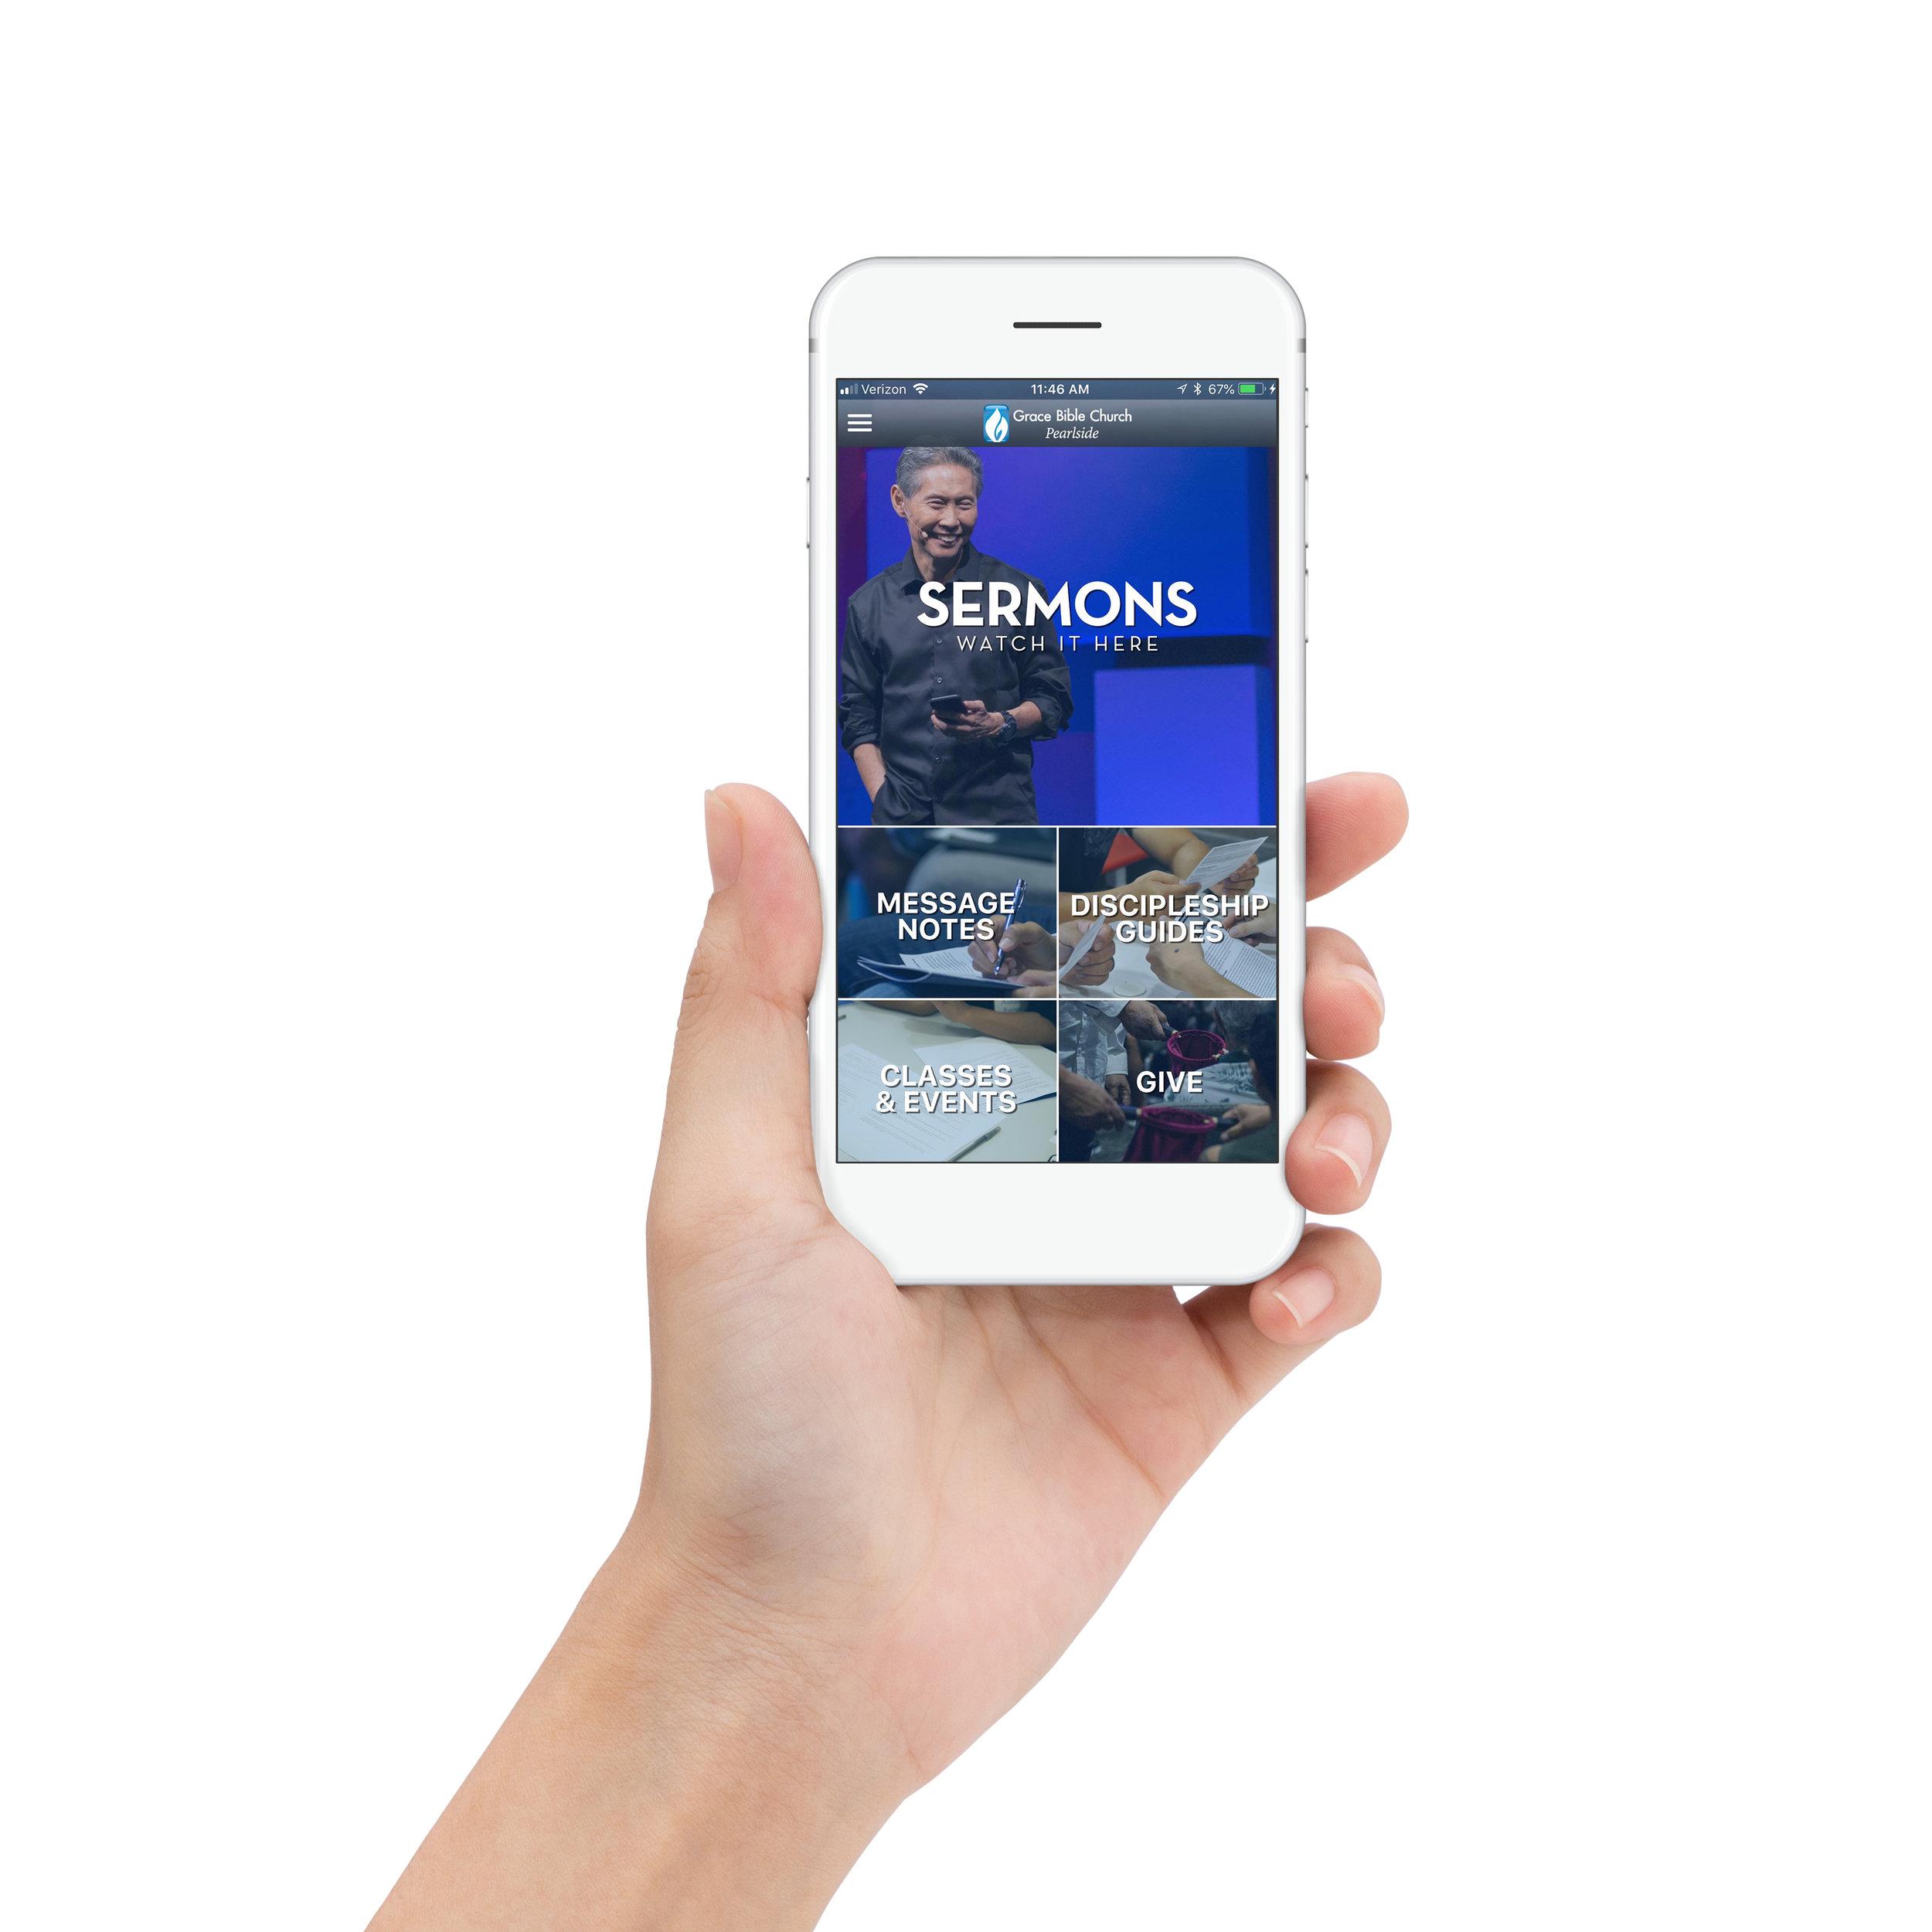 Pearlside App